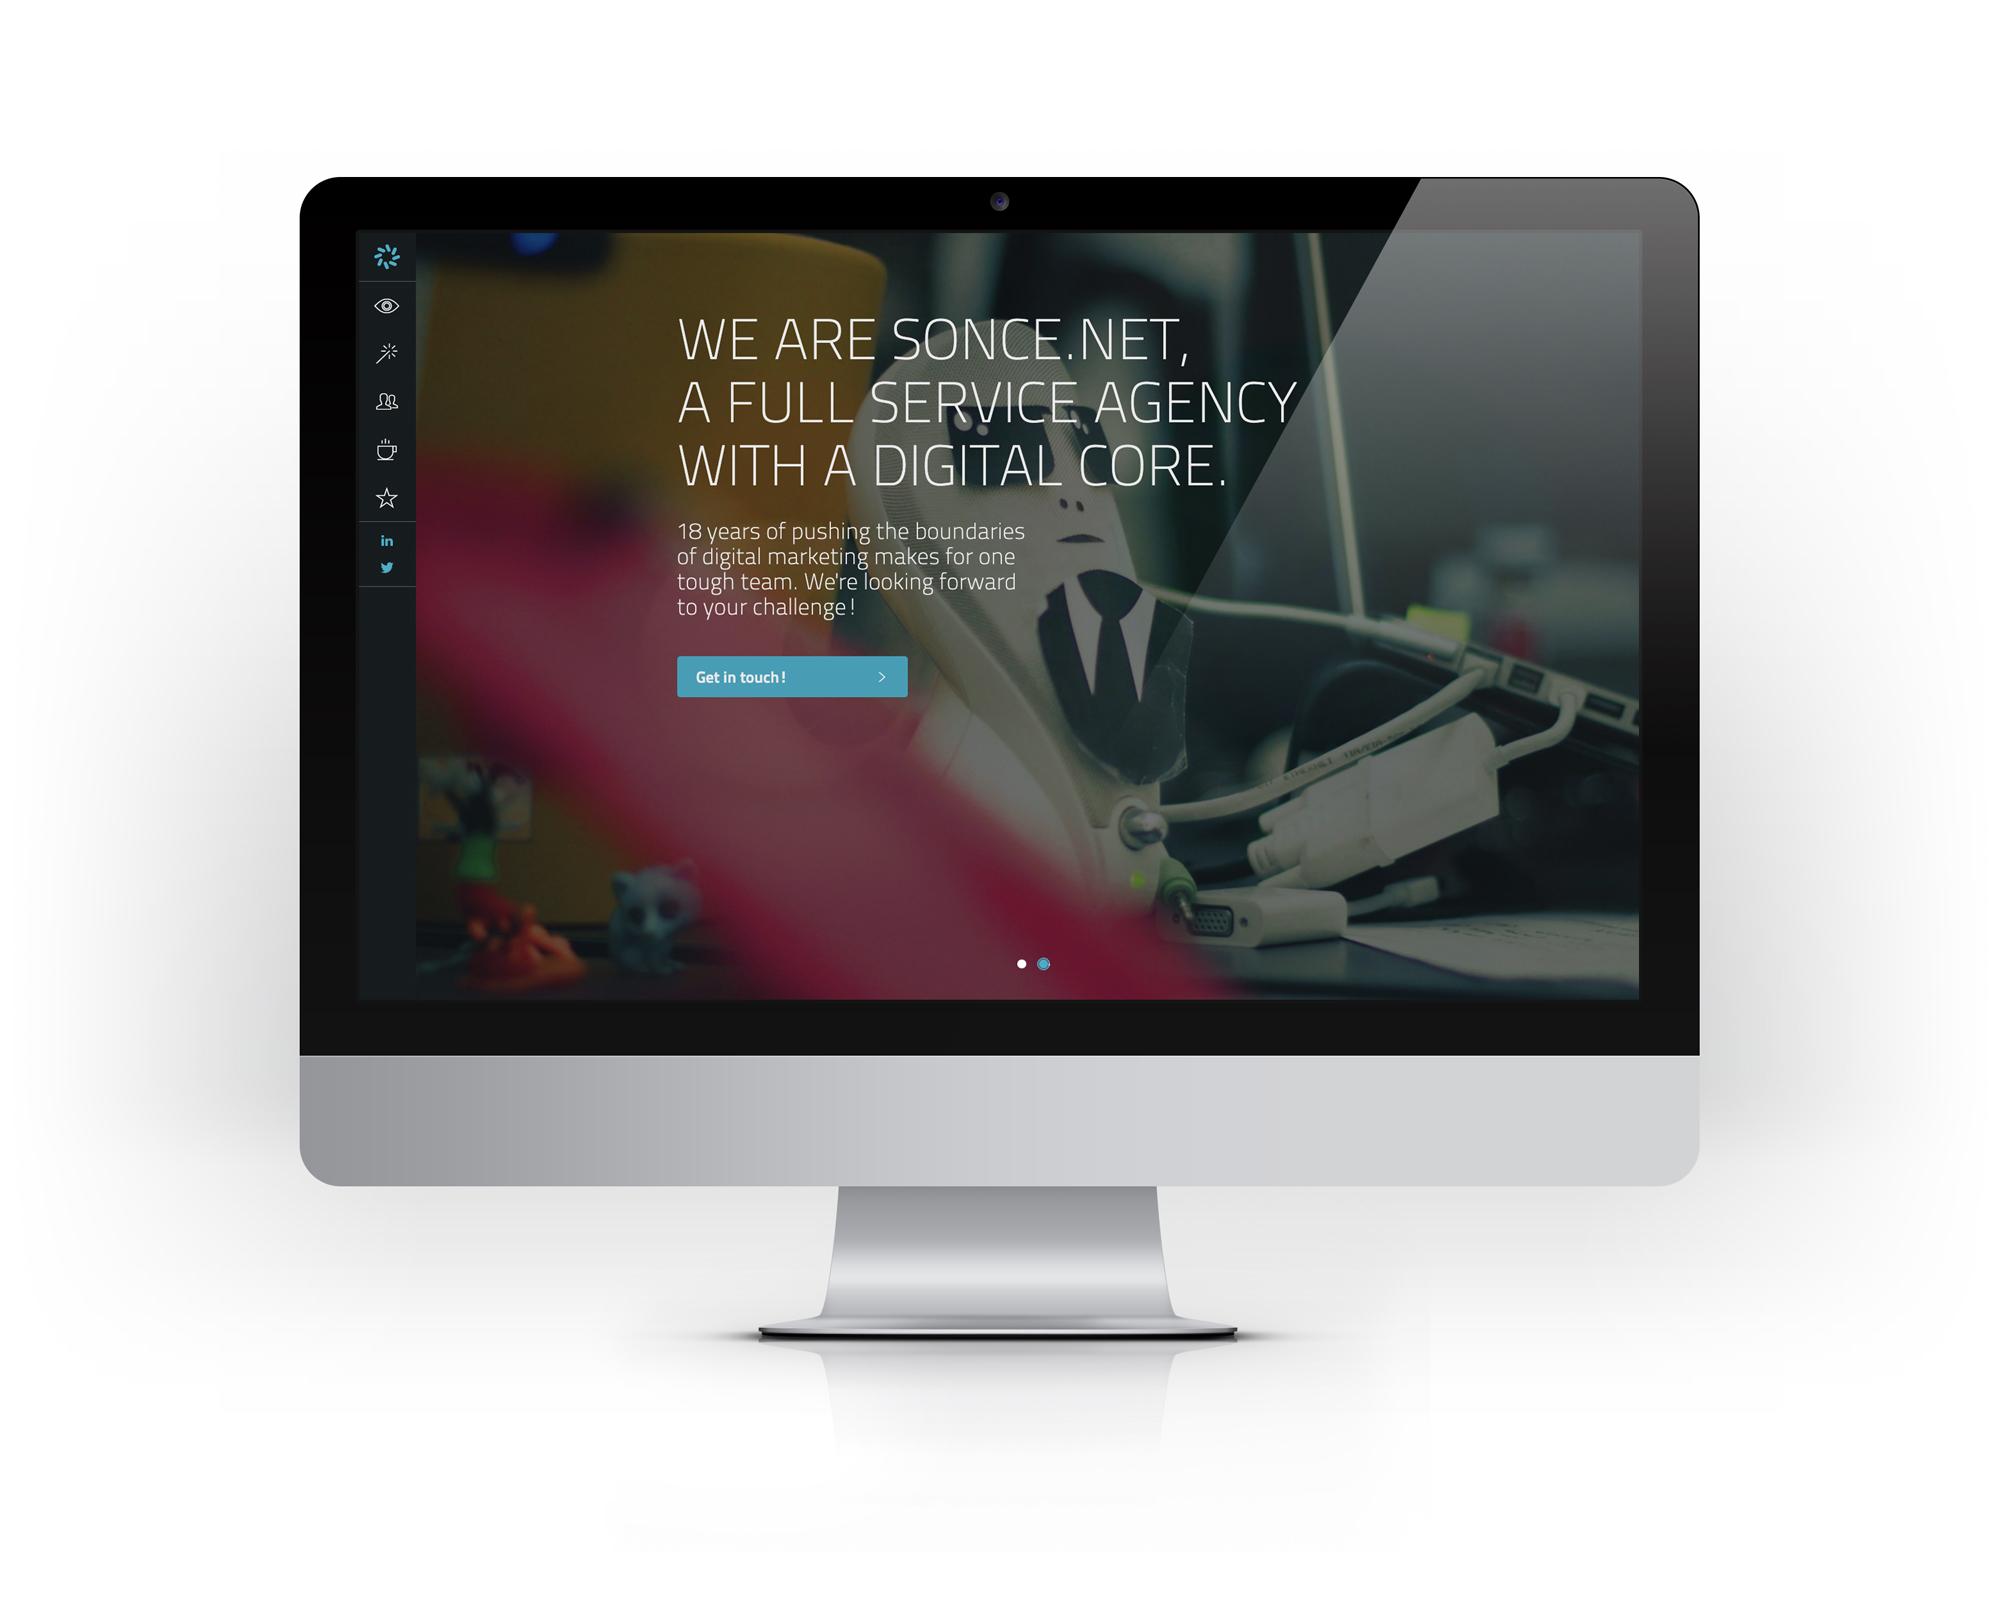 SonceNet_iMac-mock.jpg